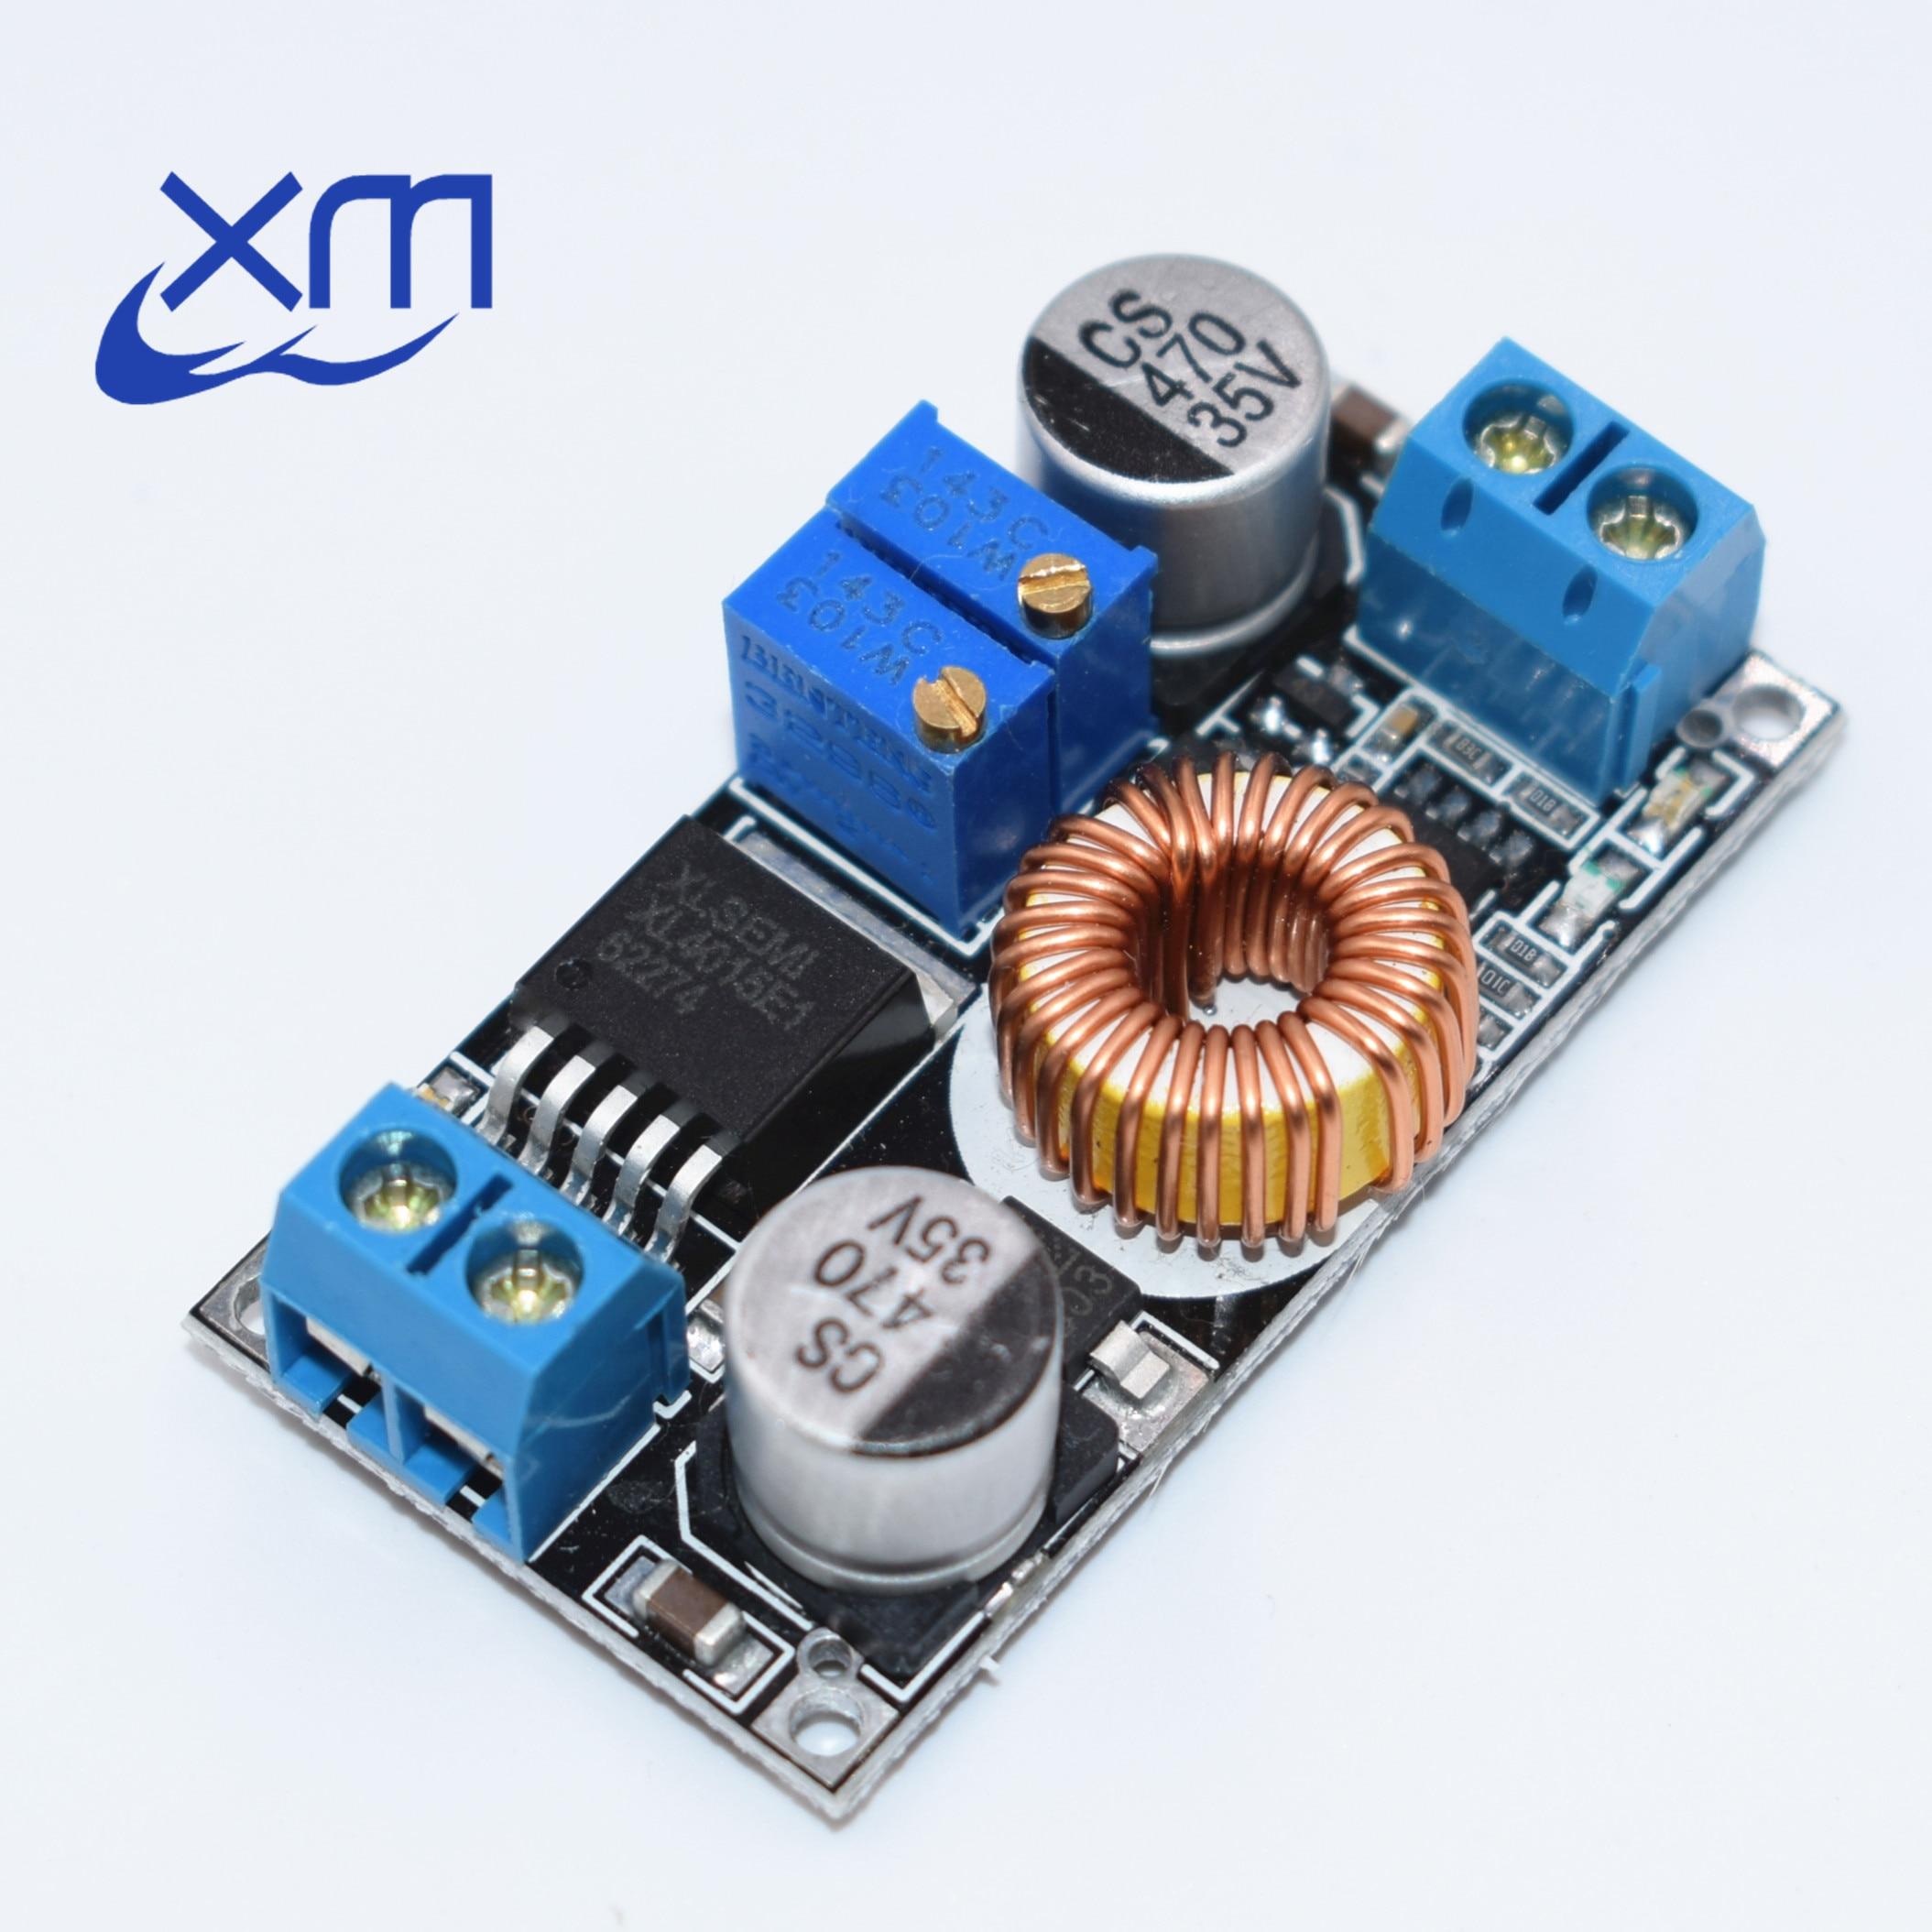 Cc Cv Adjustable Max 5a Step Down Buck Charging Board Xl4015 Lithium Li Ion Battery Charger Circuit Balancing Attiny26 Lcd Lipo 1 Pcs Dc Batterij Opladen Led Power